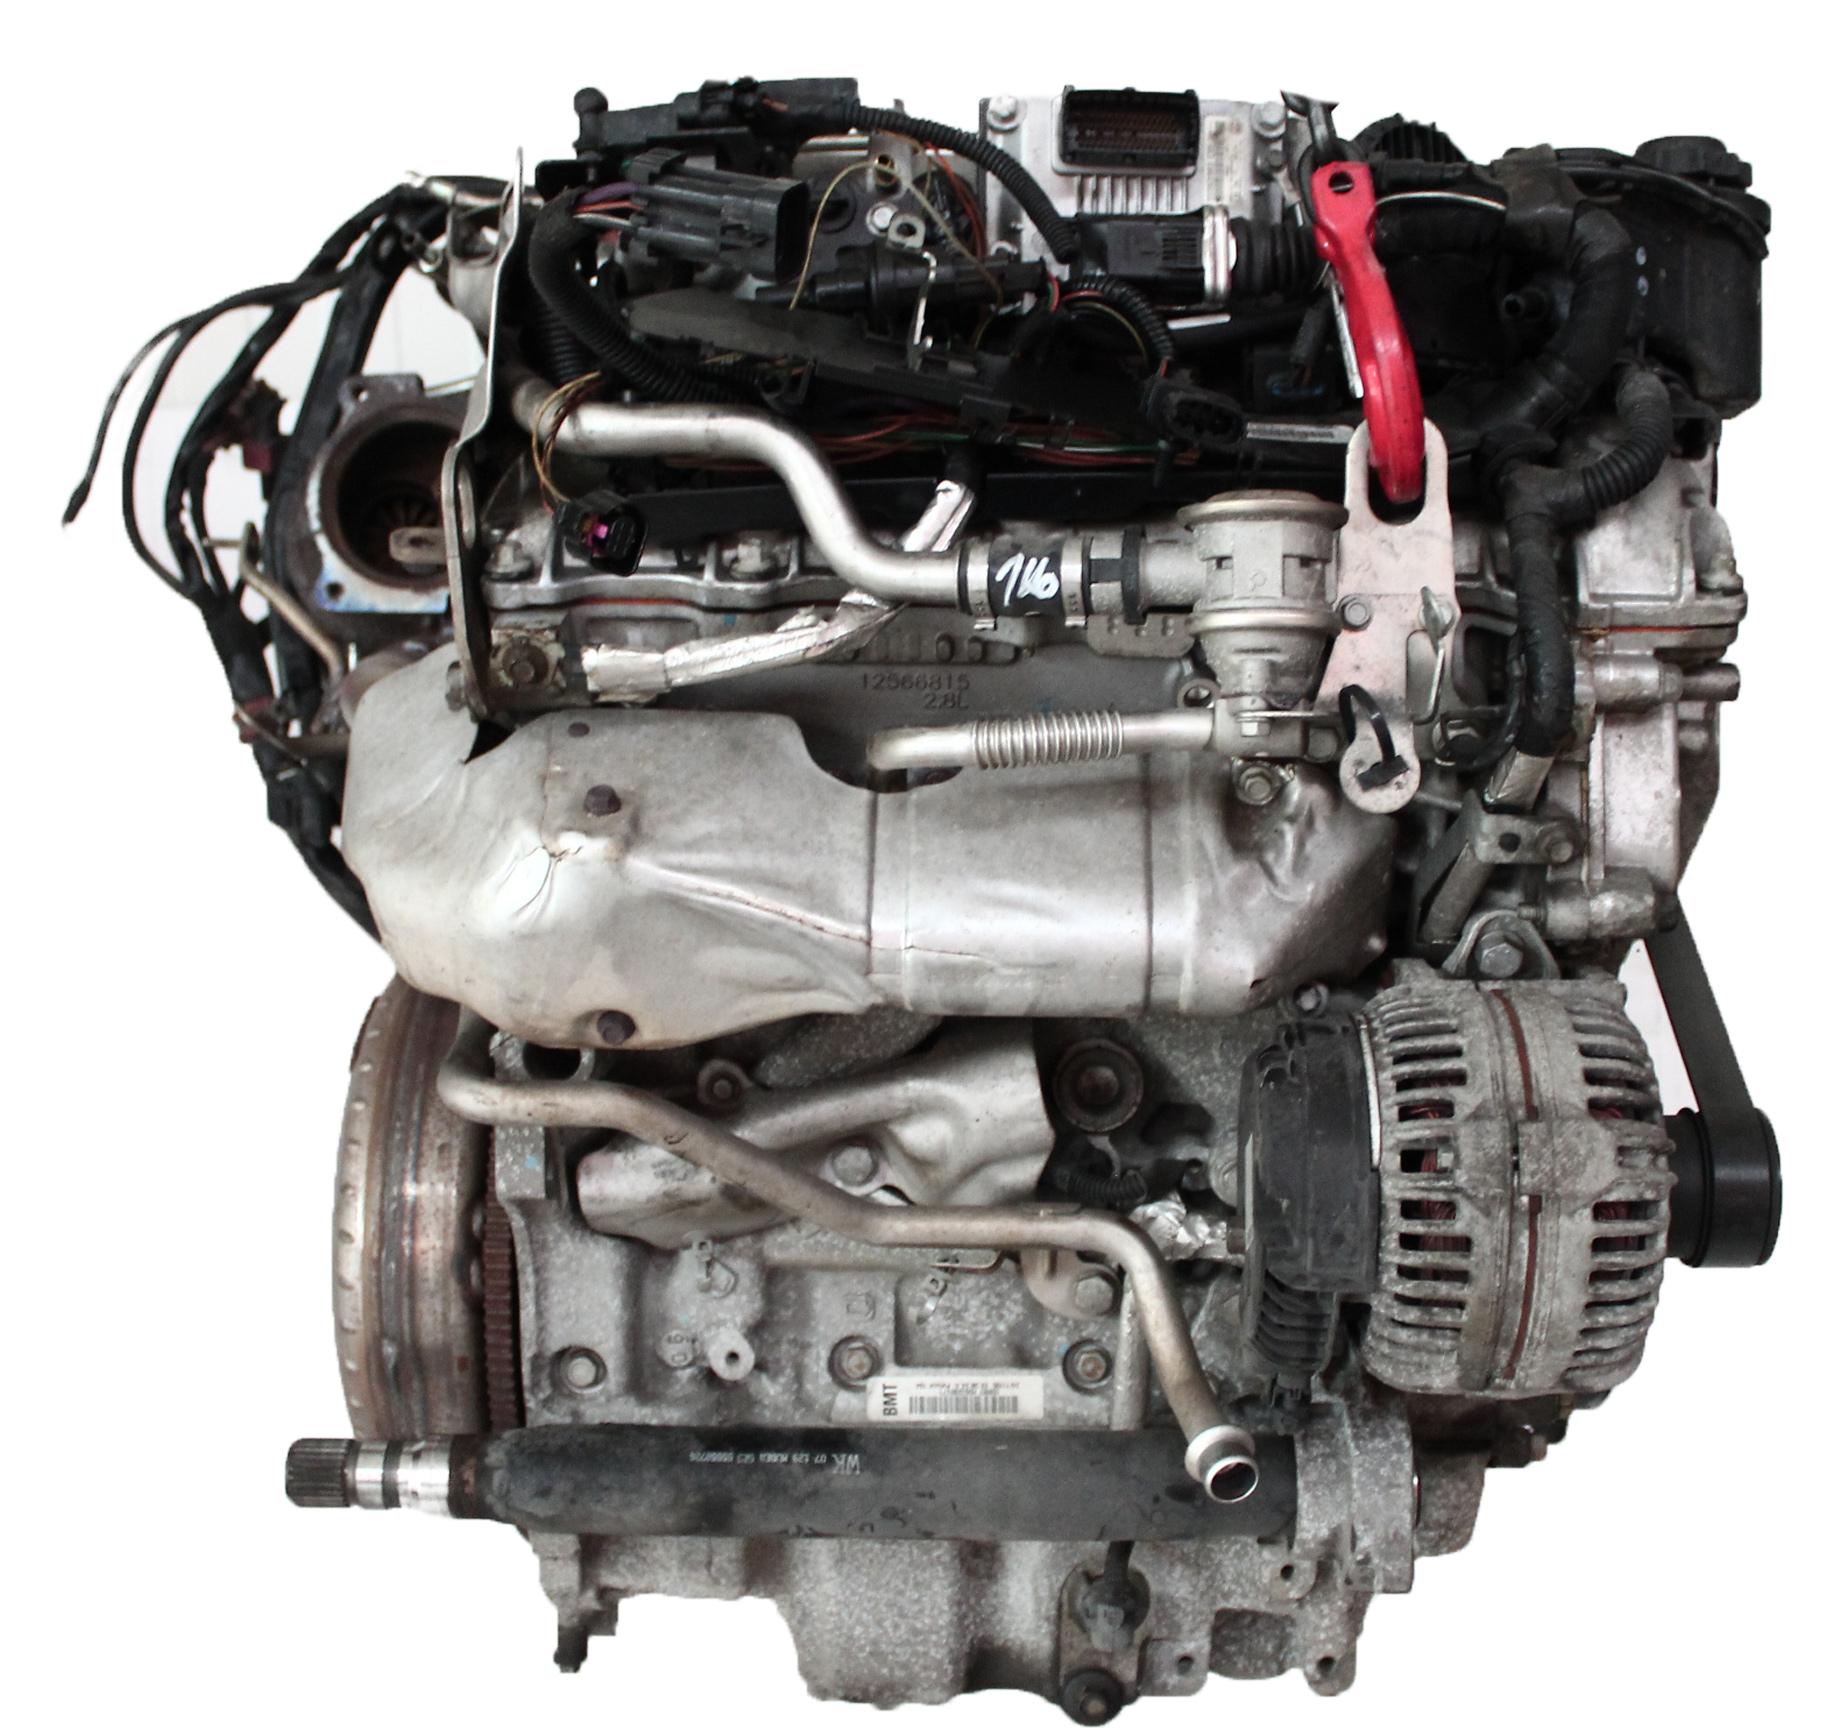 Motor 2007 Opel Vectra C Signum 2,8 V6 Z28NET Z28 250 PS mit Anbauteilen